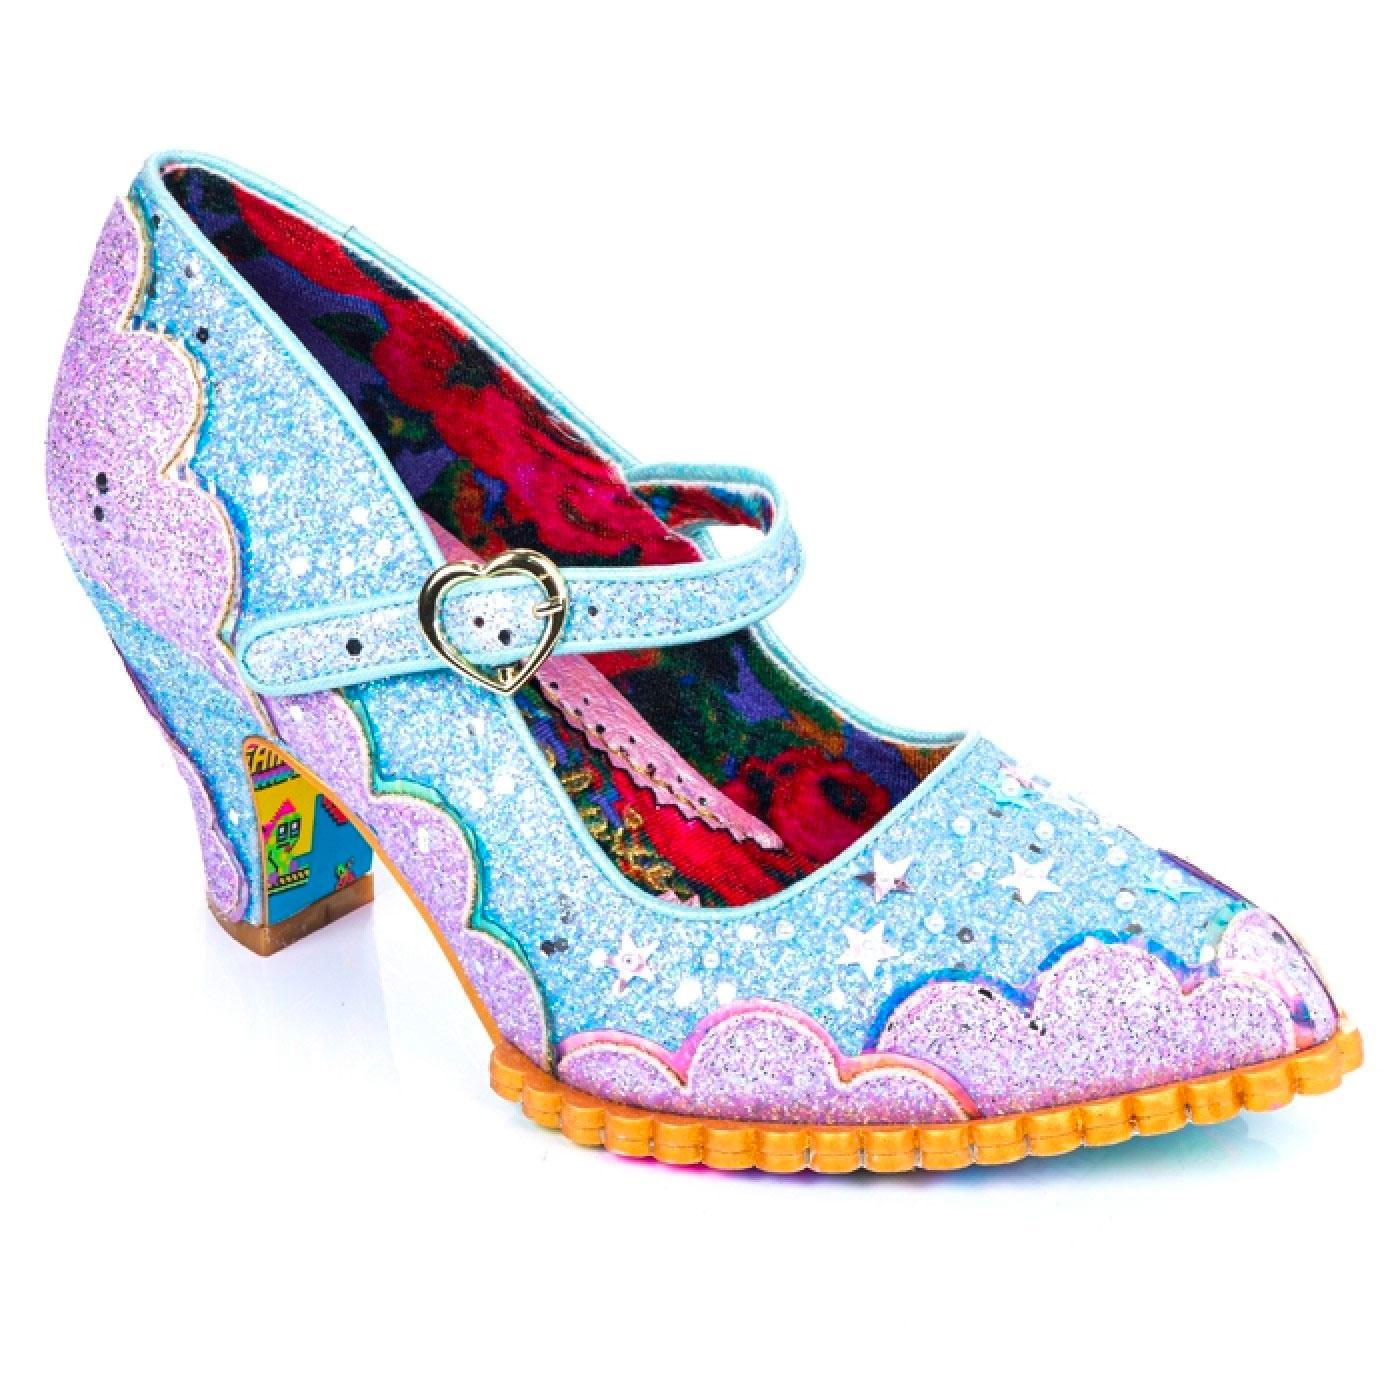 Shortie Bread IRREGULAR CHOICE Blue Glitter Heels